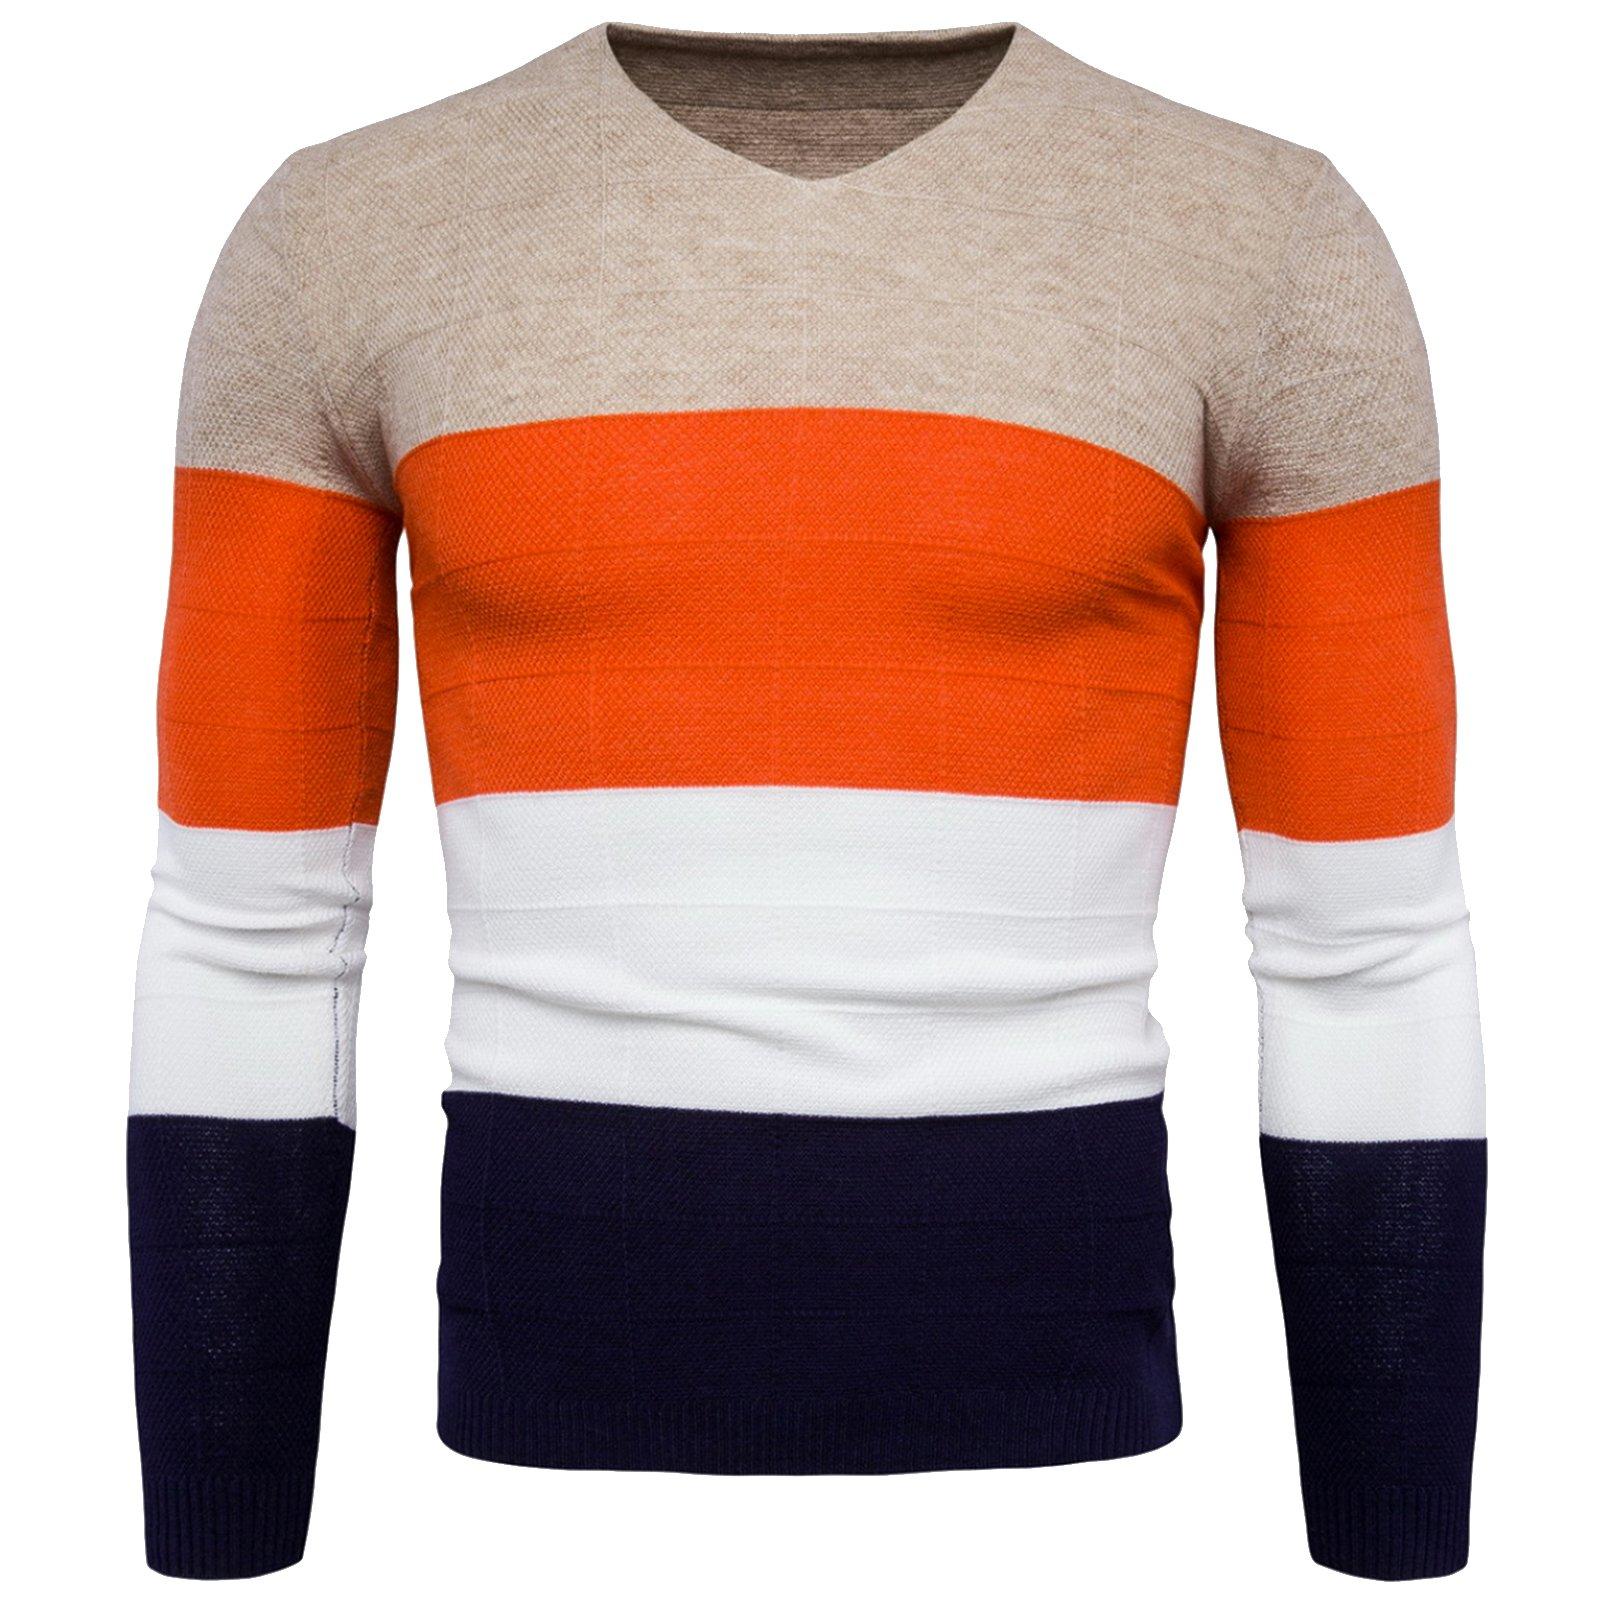 WSLCN Mens Chic Fine Knit V-Neck Coton Jumper Pullover Contrast Color Sweater Beige US XS (Asian M)